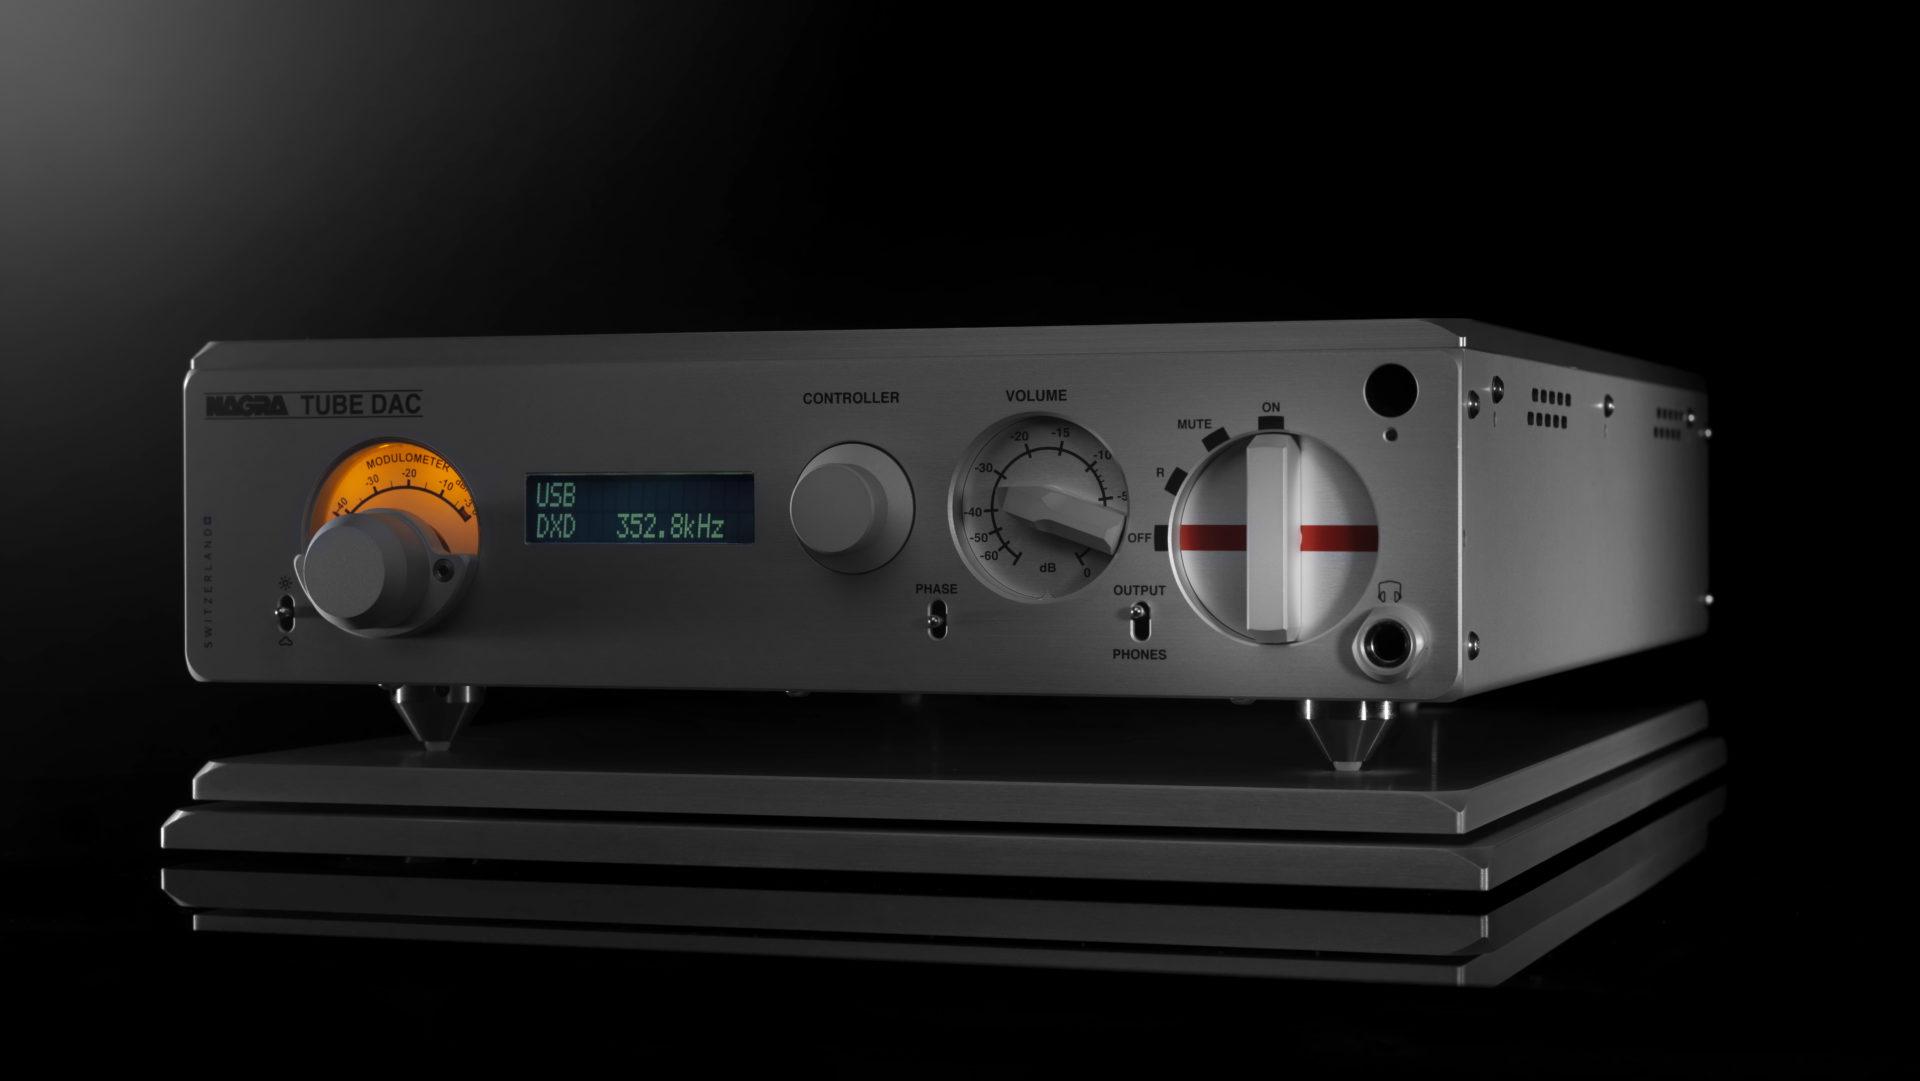 Nagra TUBE DAC digital to analog converter high end top best top front modulometer vfs